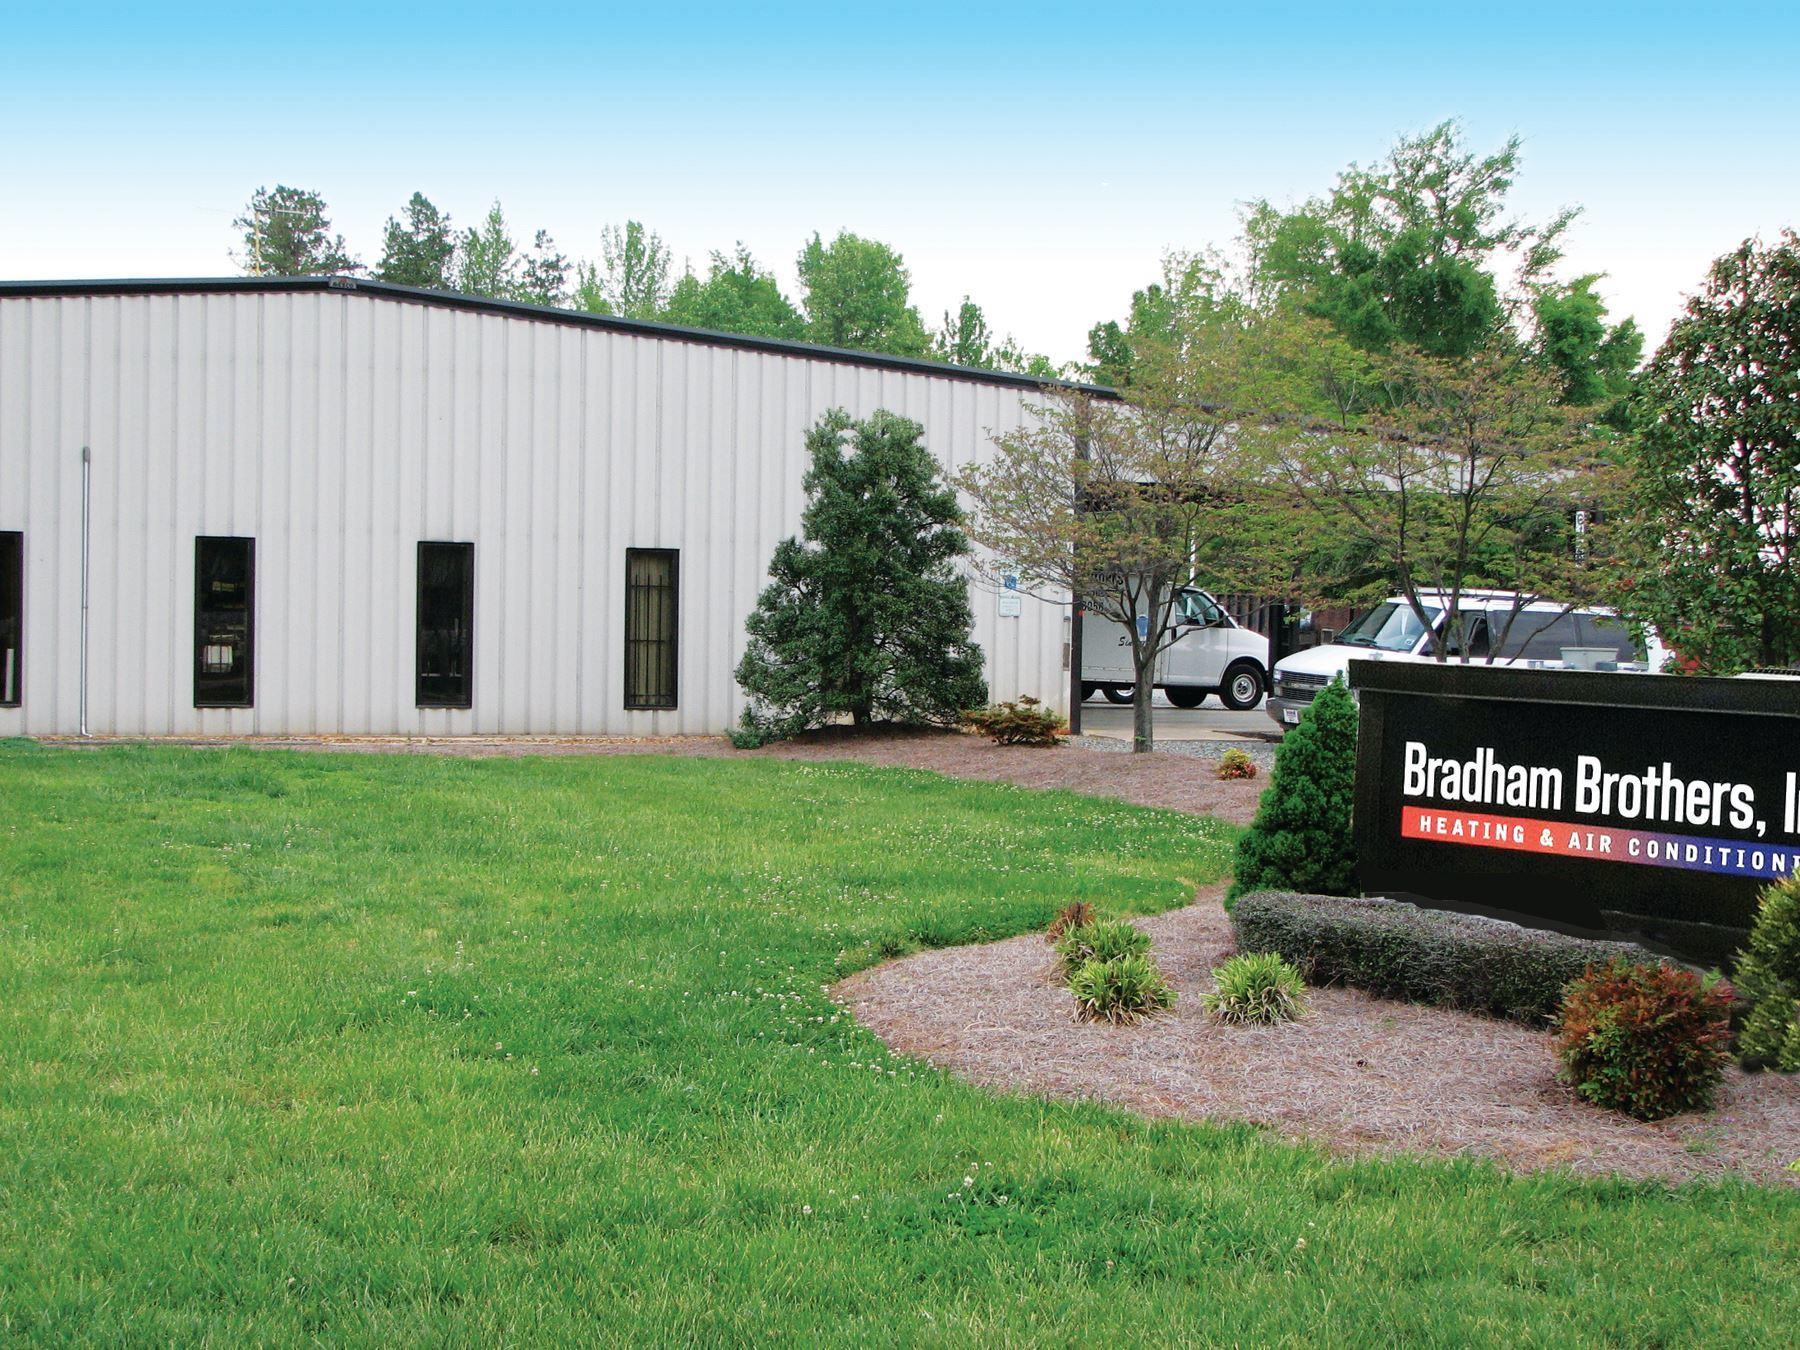 Bradham Brothers, Inc. image 1